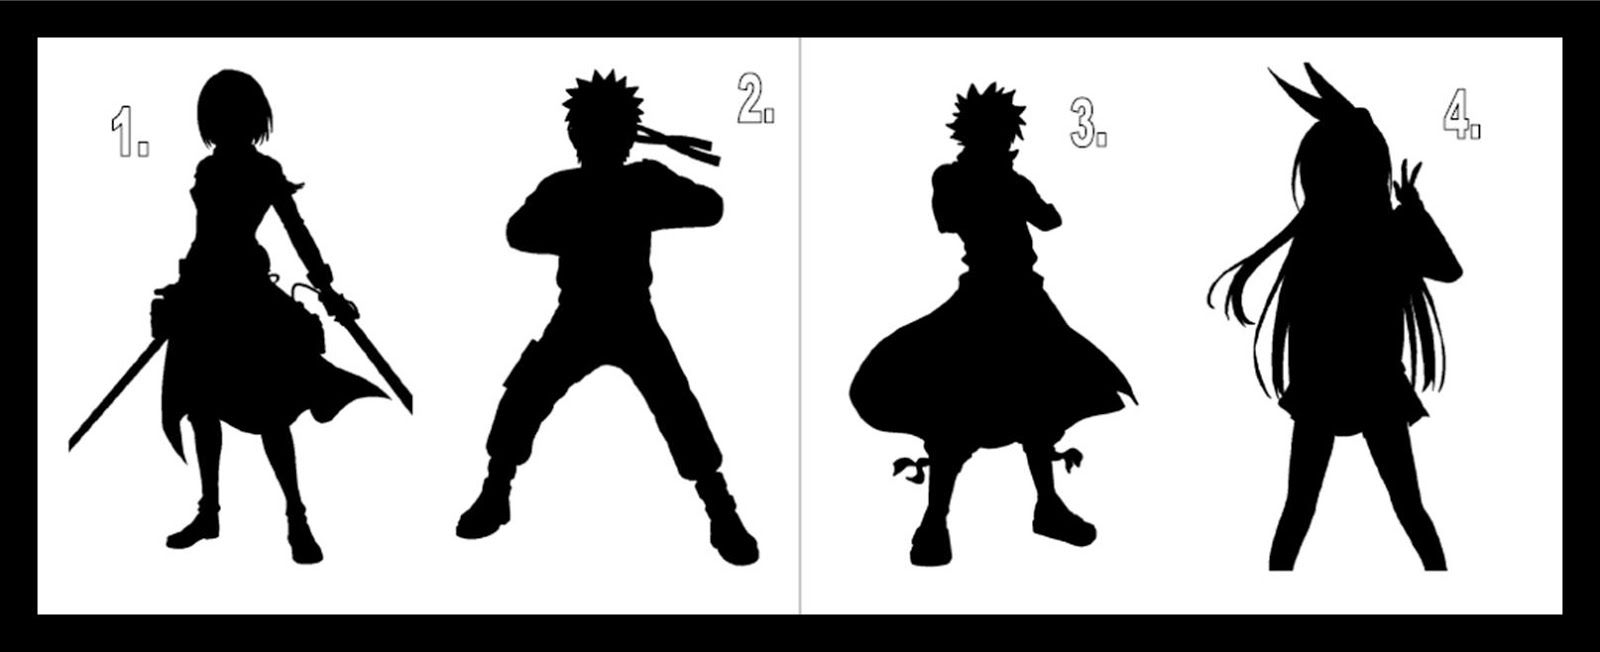 Anime Silhouettes Game